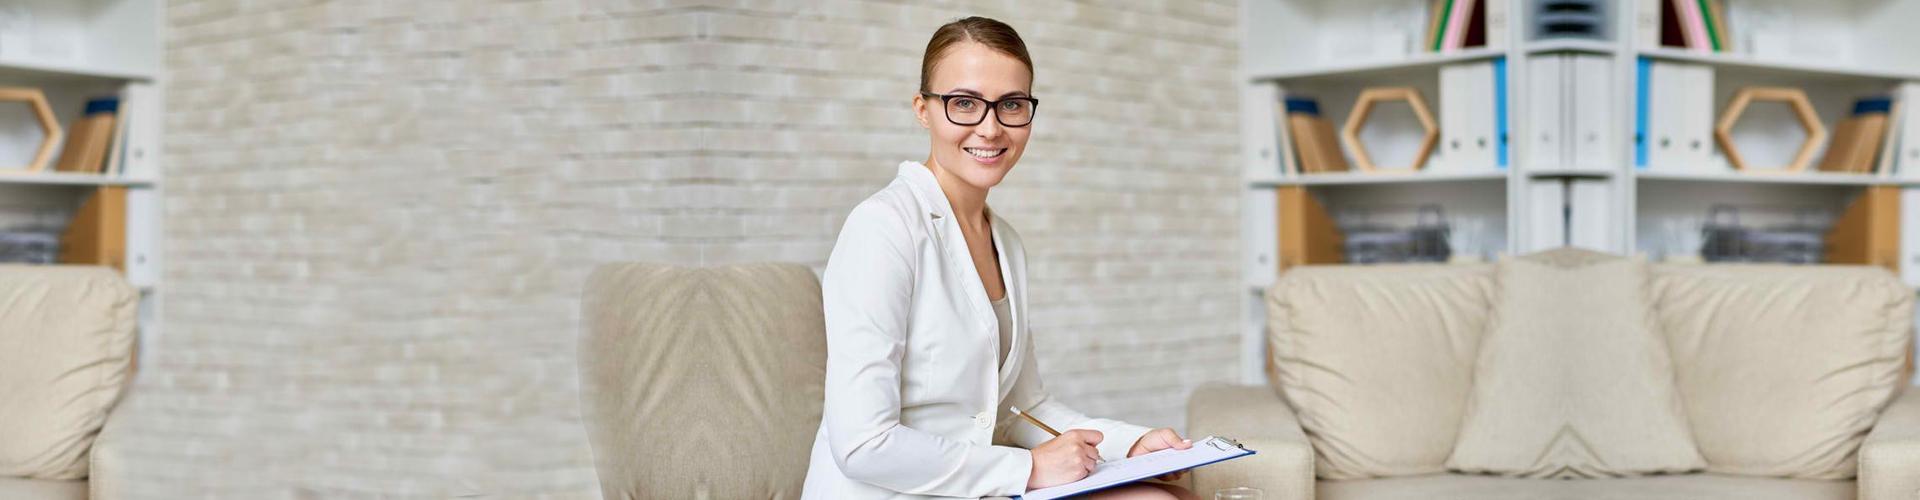 a pyschiatrist wearing glasses smiling